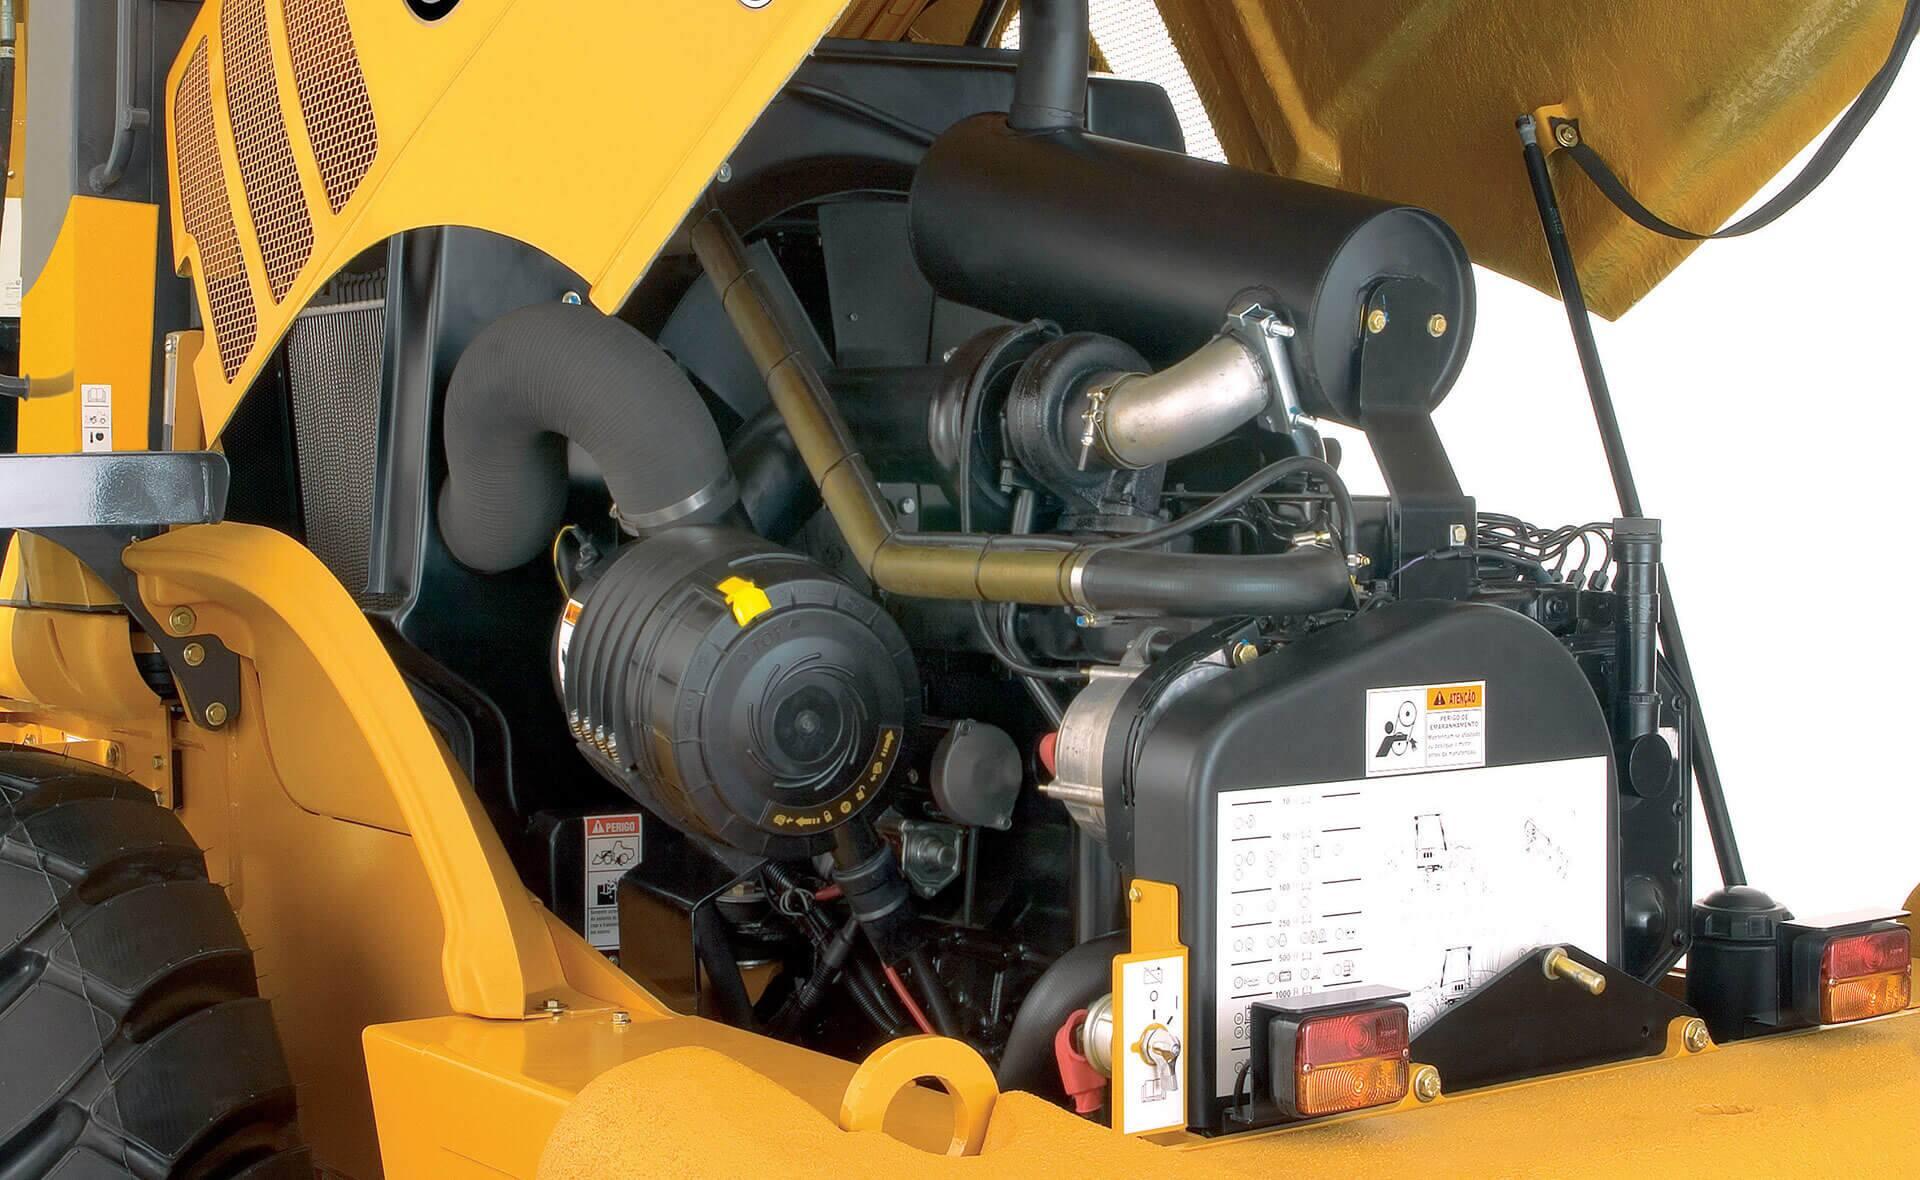 621d wheel loader case Case Maxxum Wiring Diagram